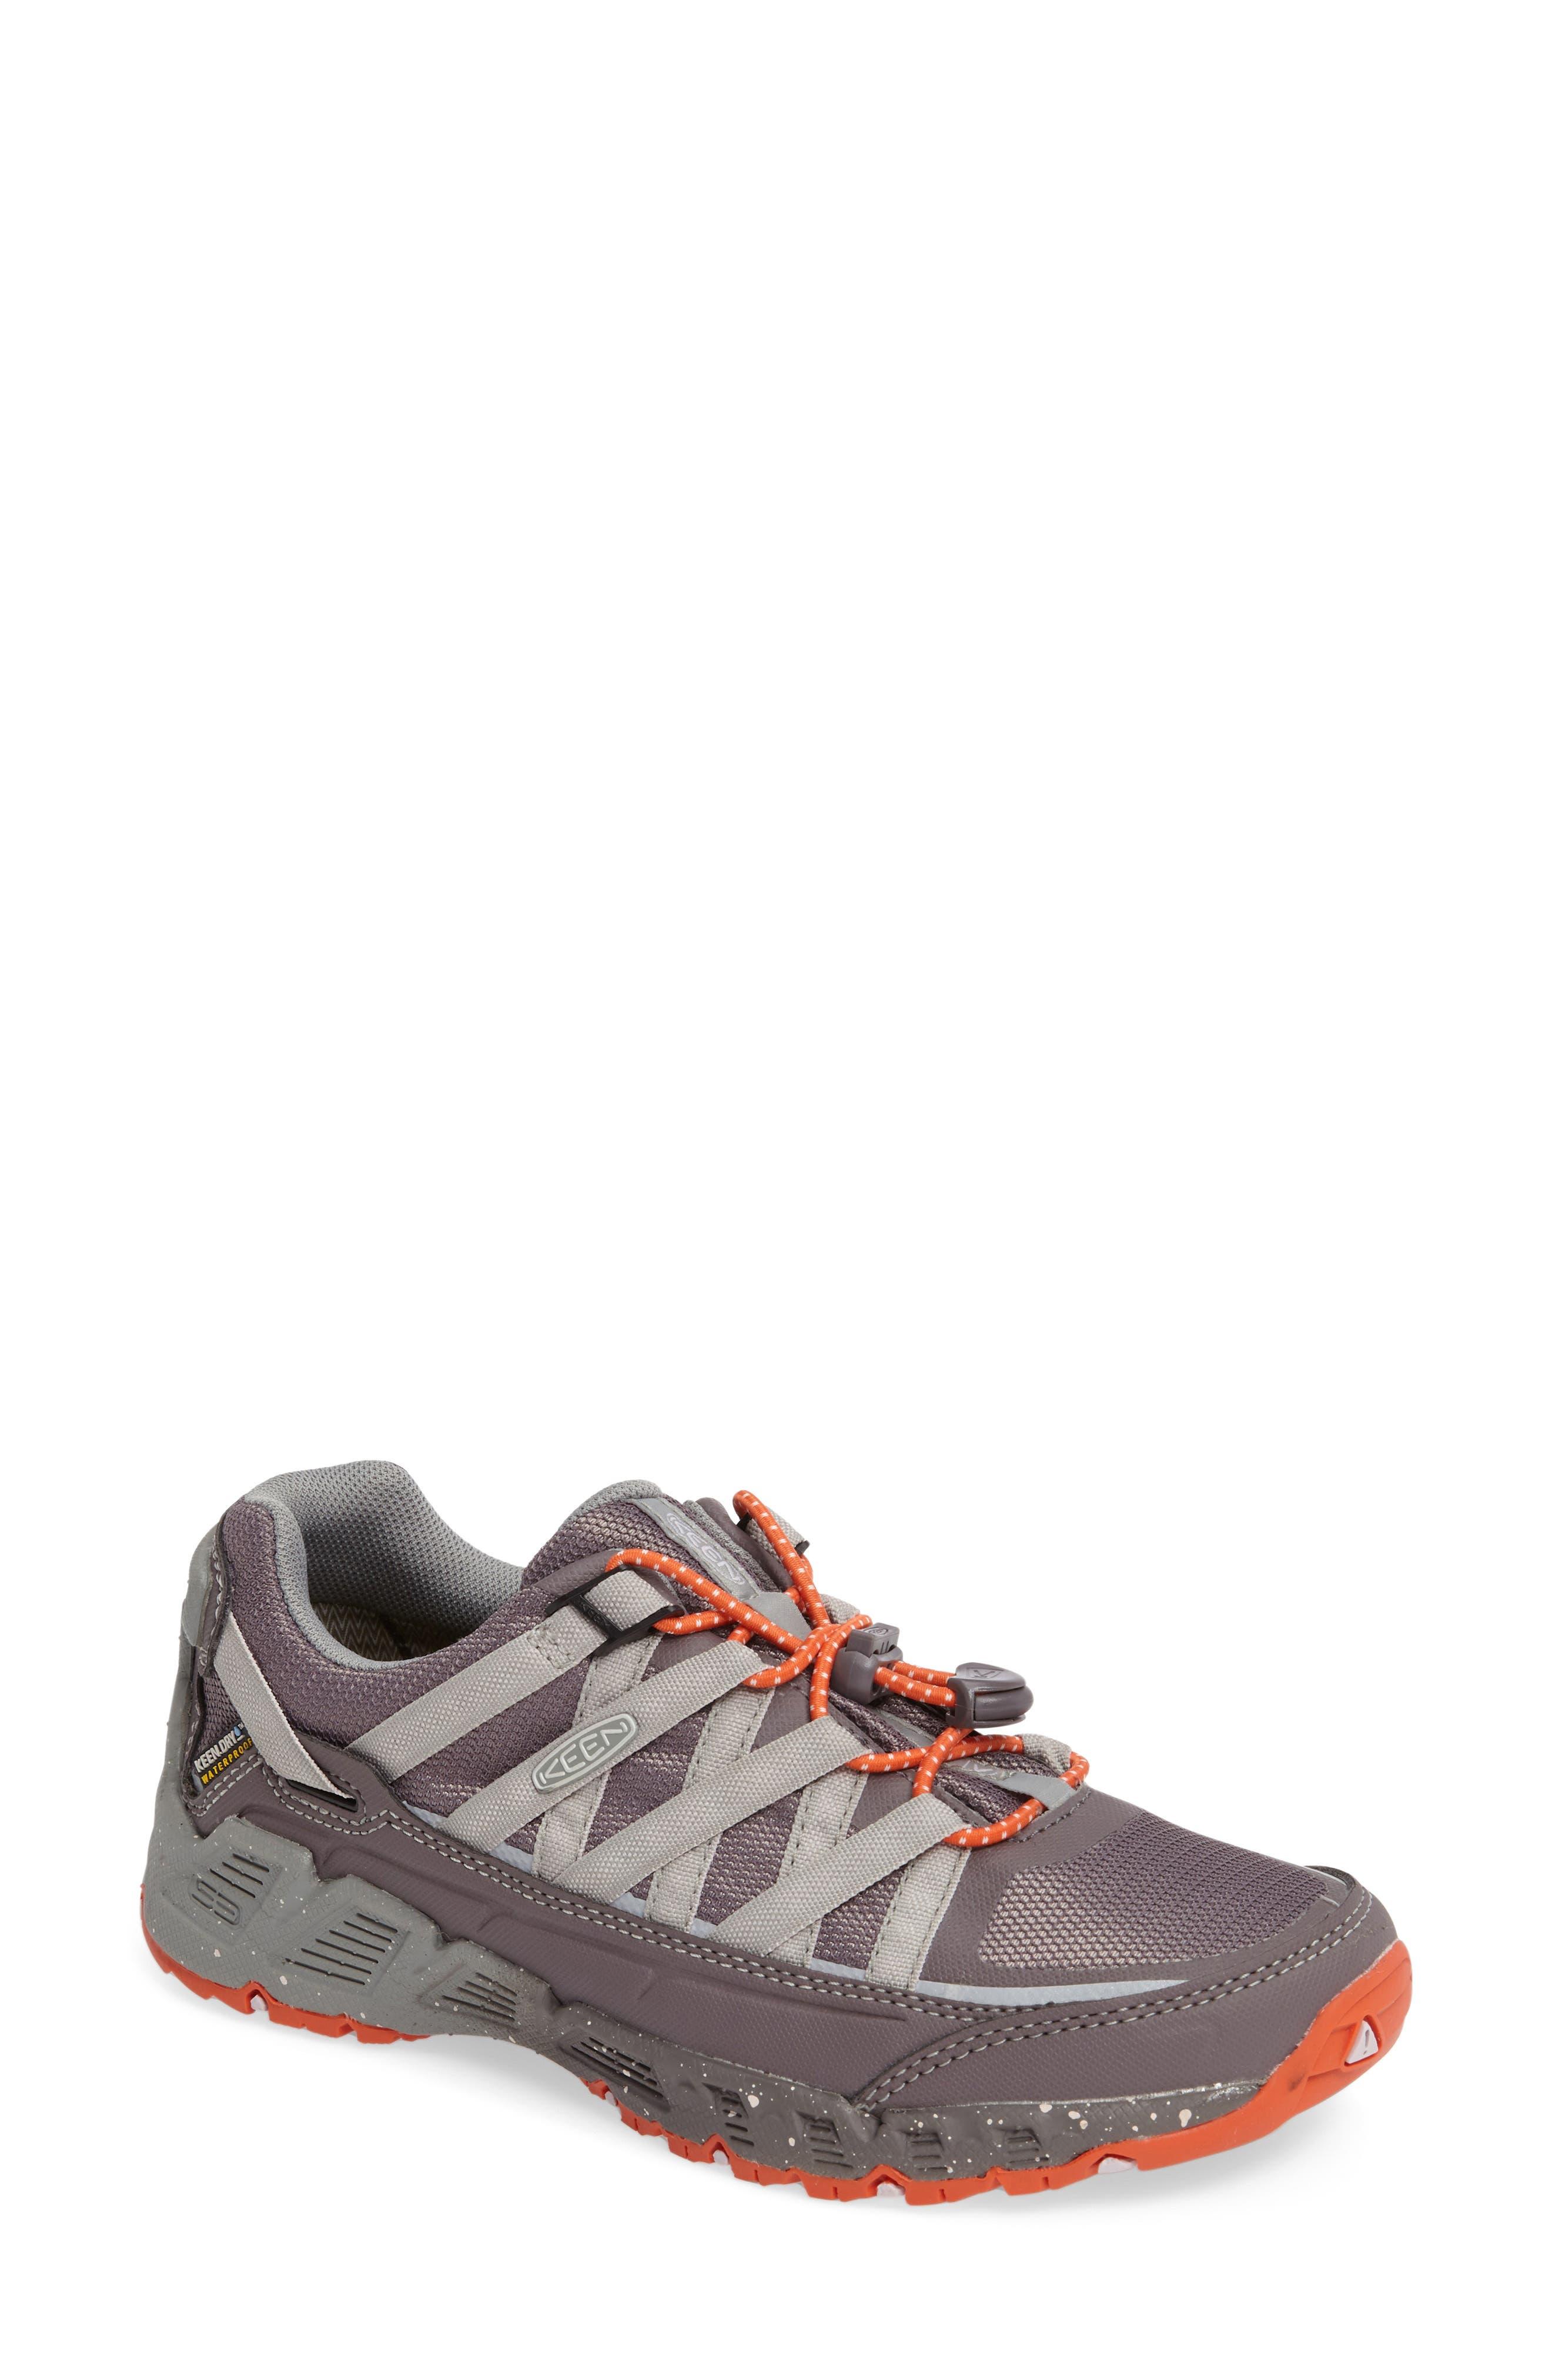 Main Image - Keen 'Versatrail' Waterproof Hiking Shoe (Women)